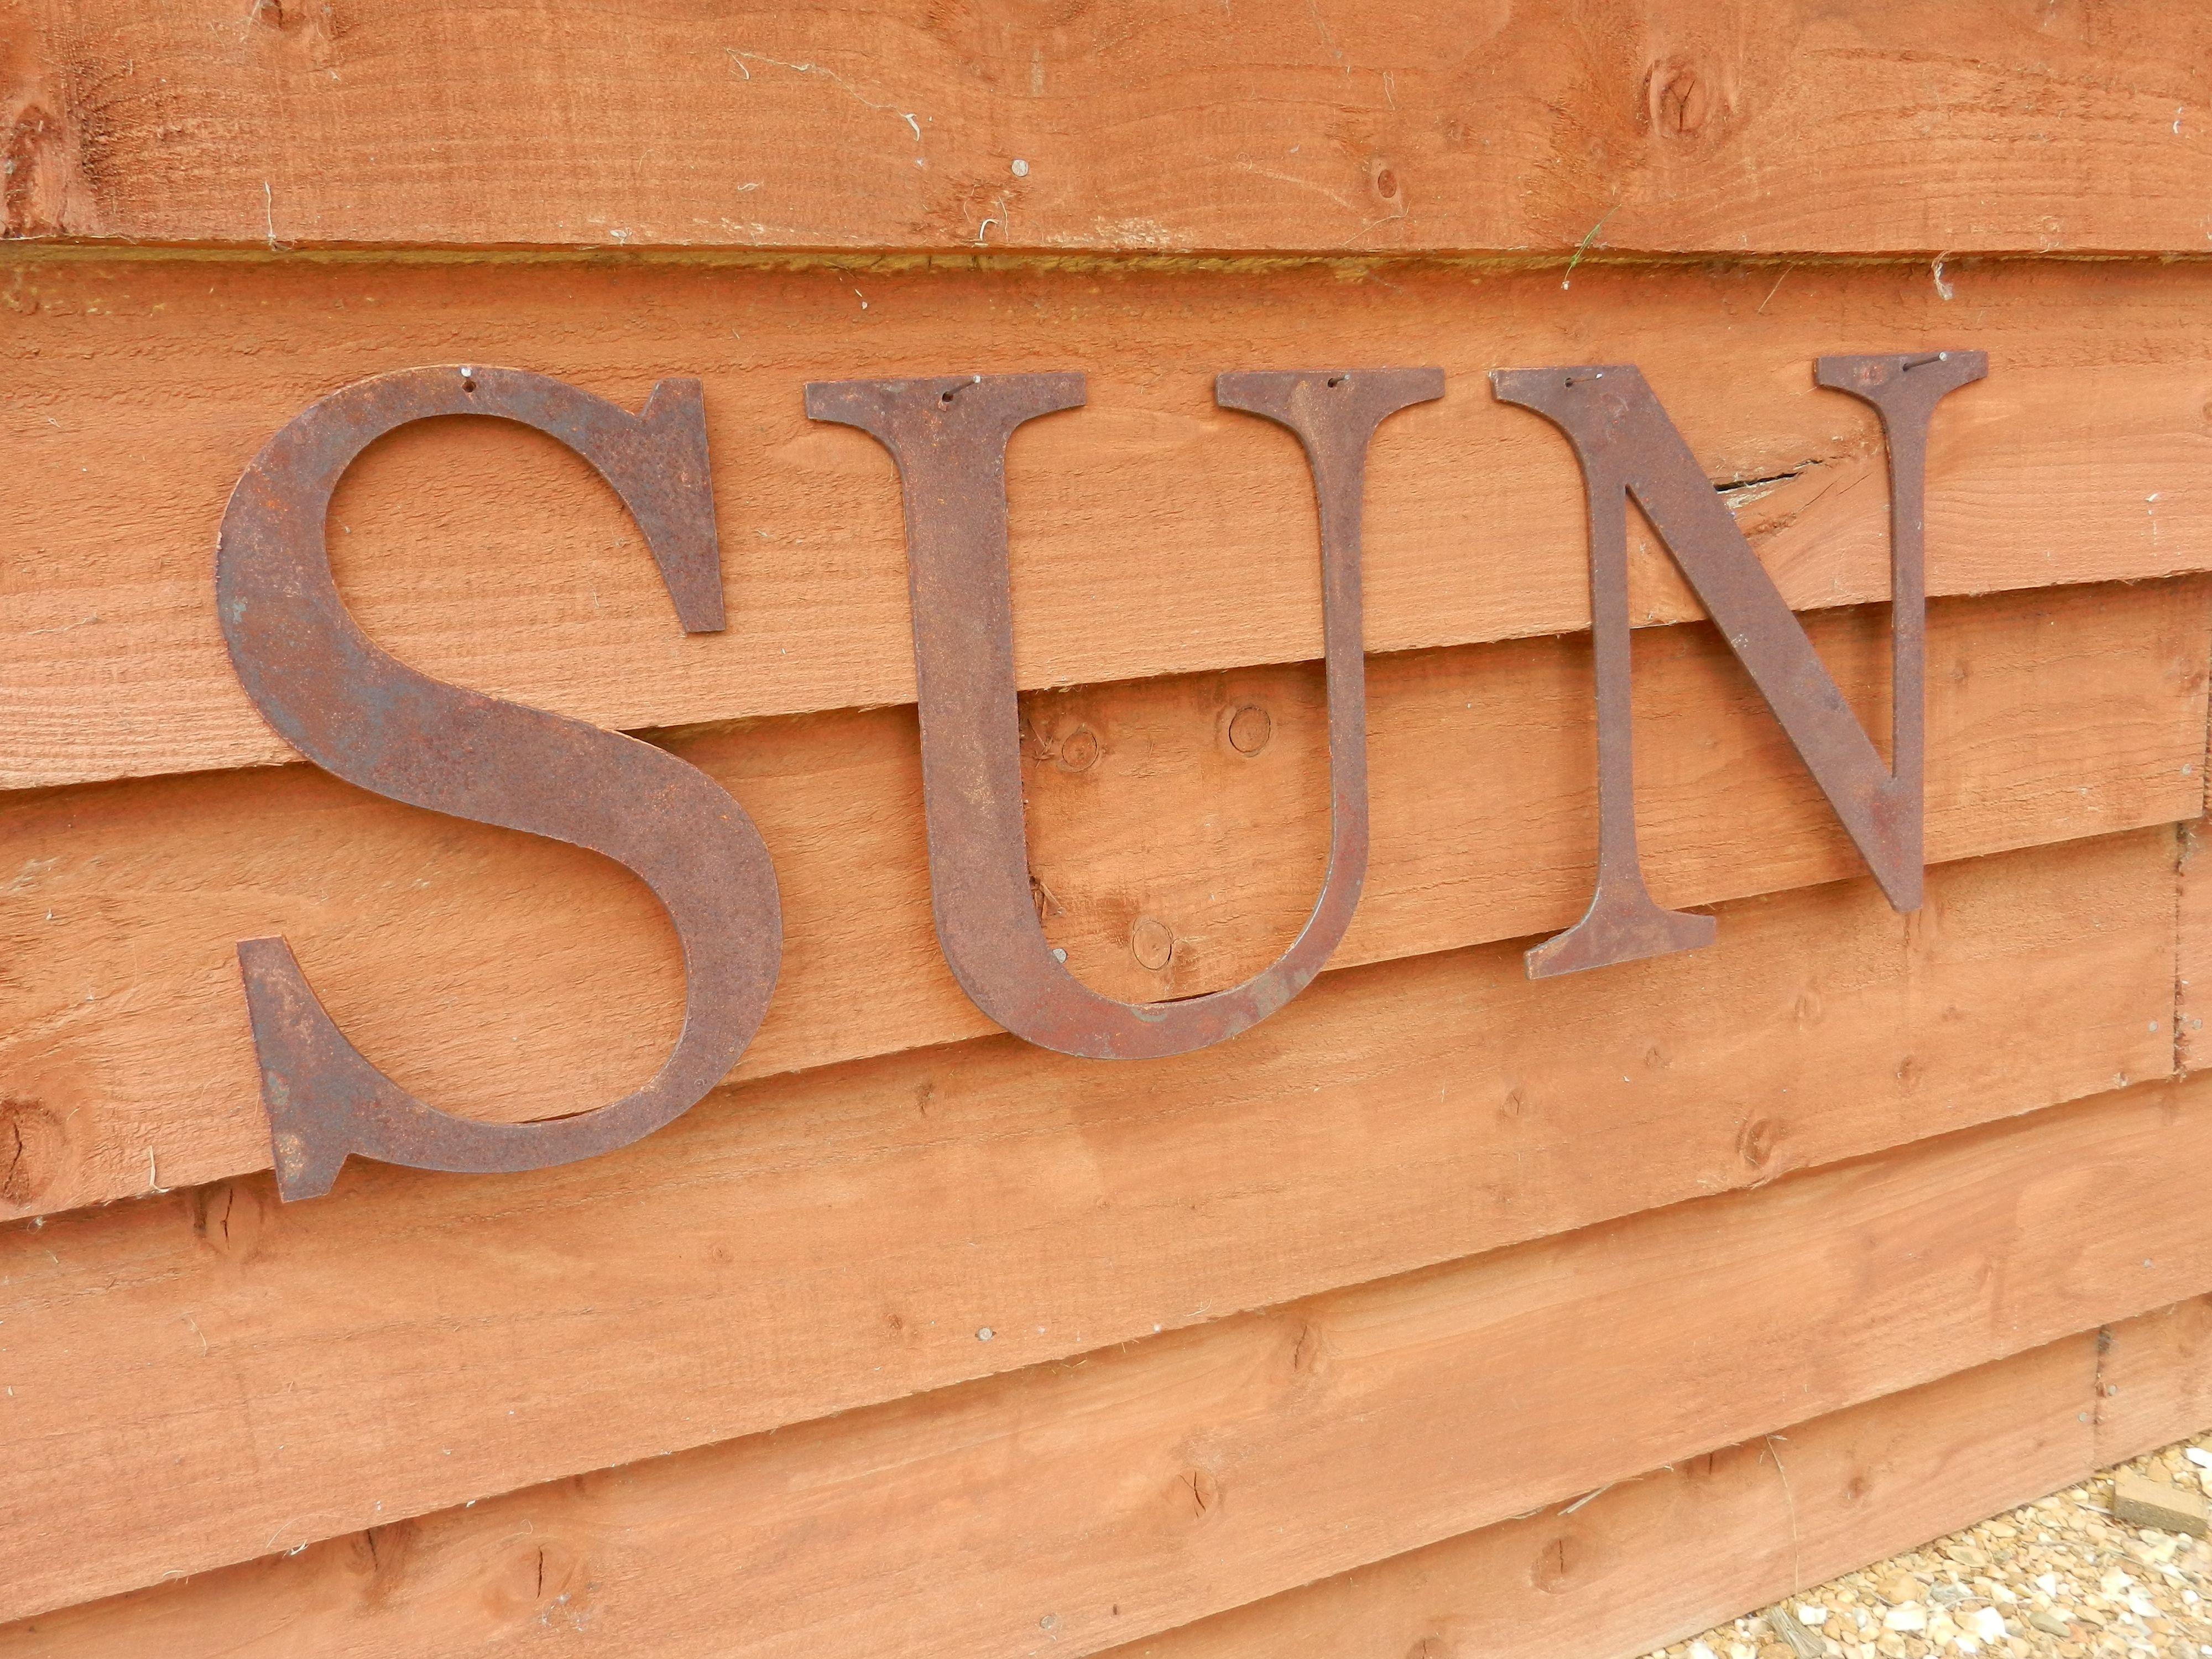 Metal Garden Letters Rusty Metal Sun Lettersrusty Rooster  British Handmade Rusty